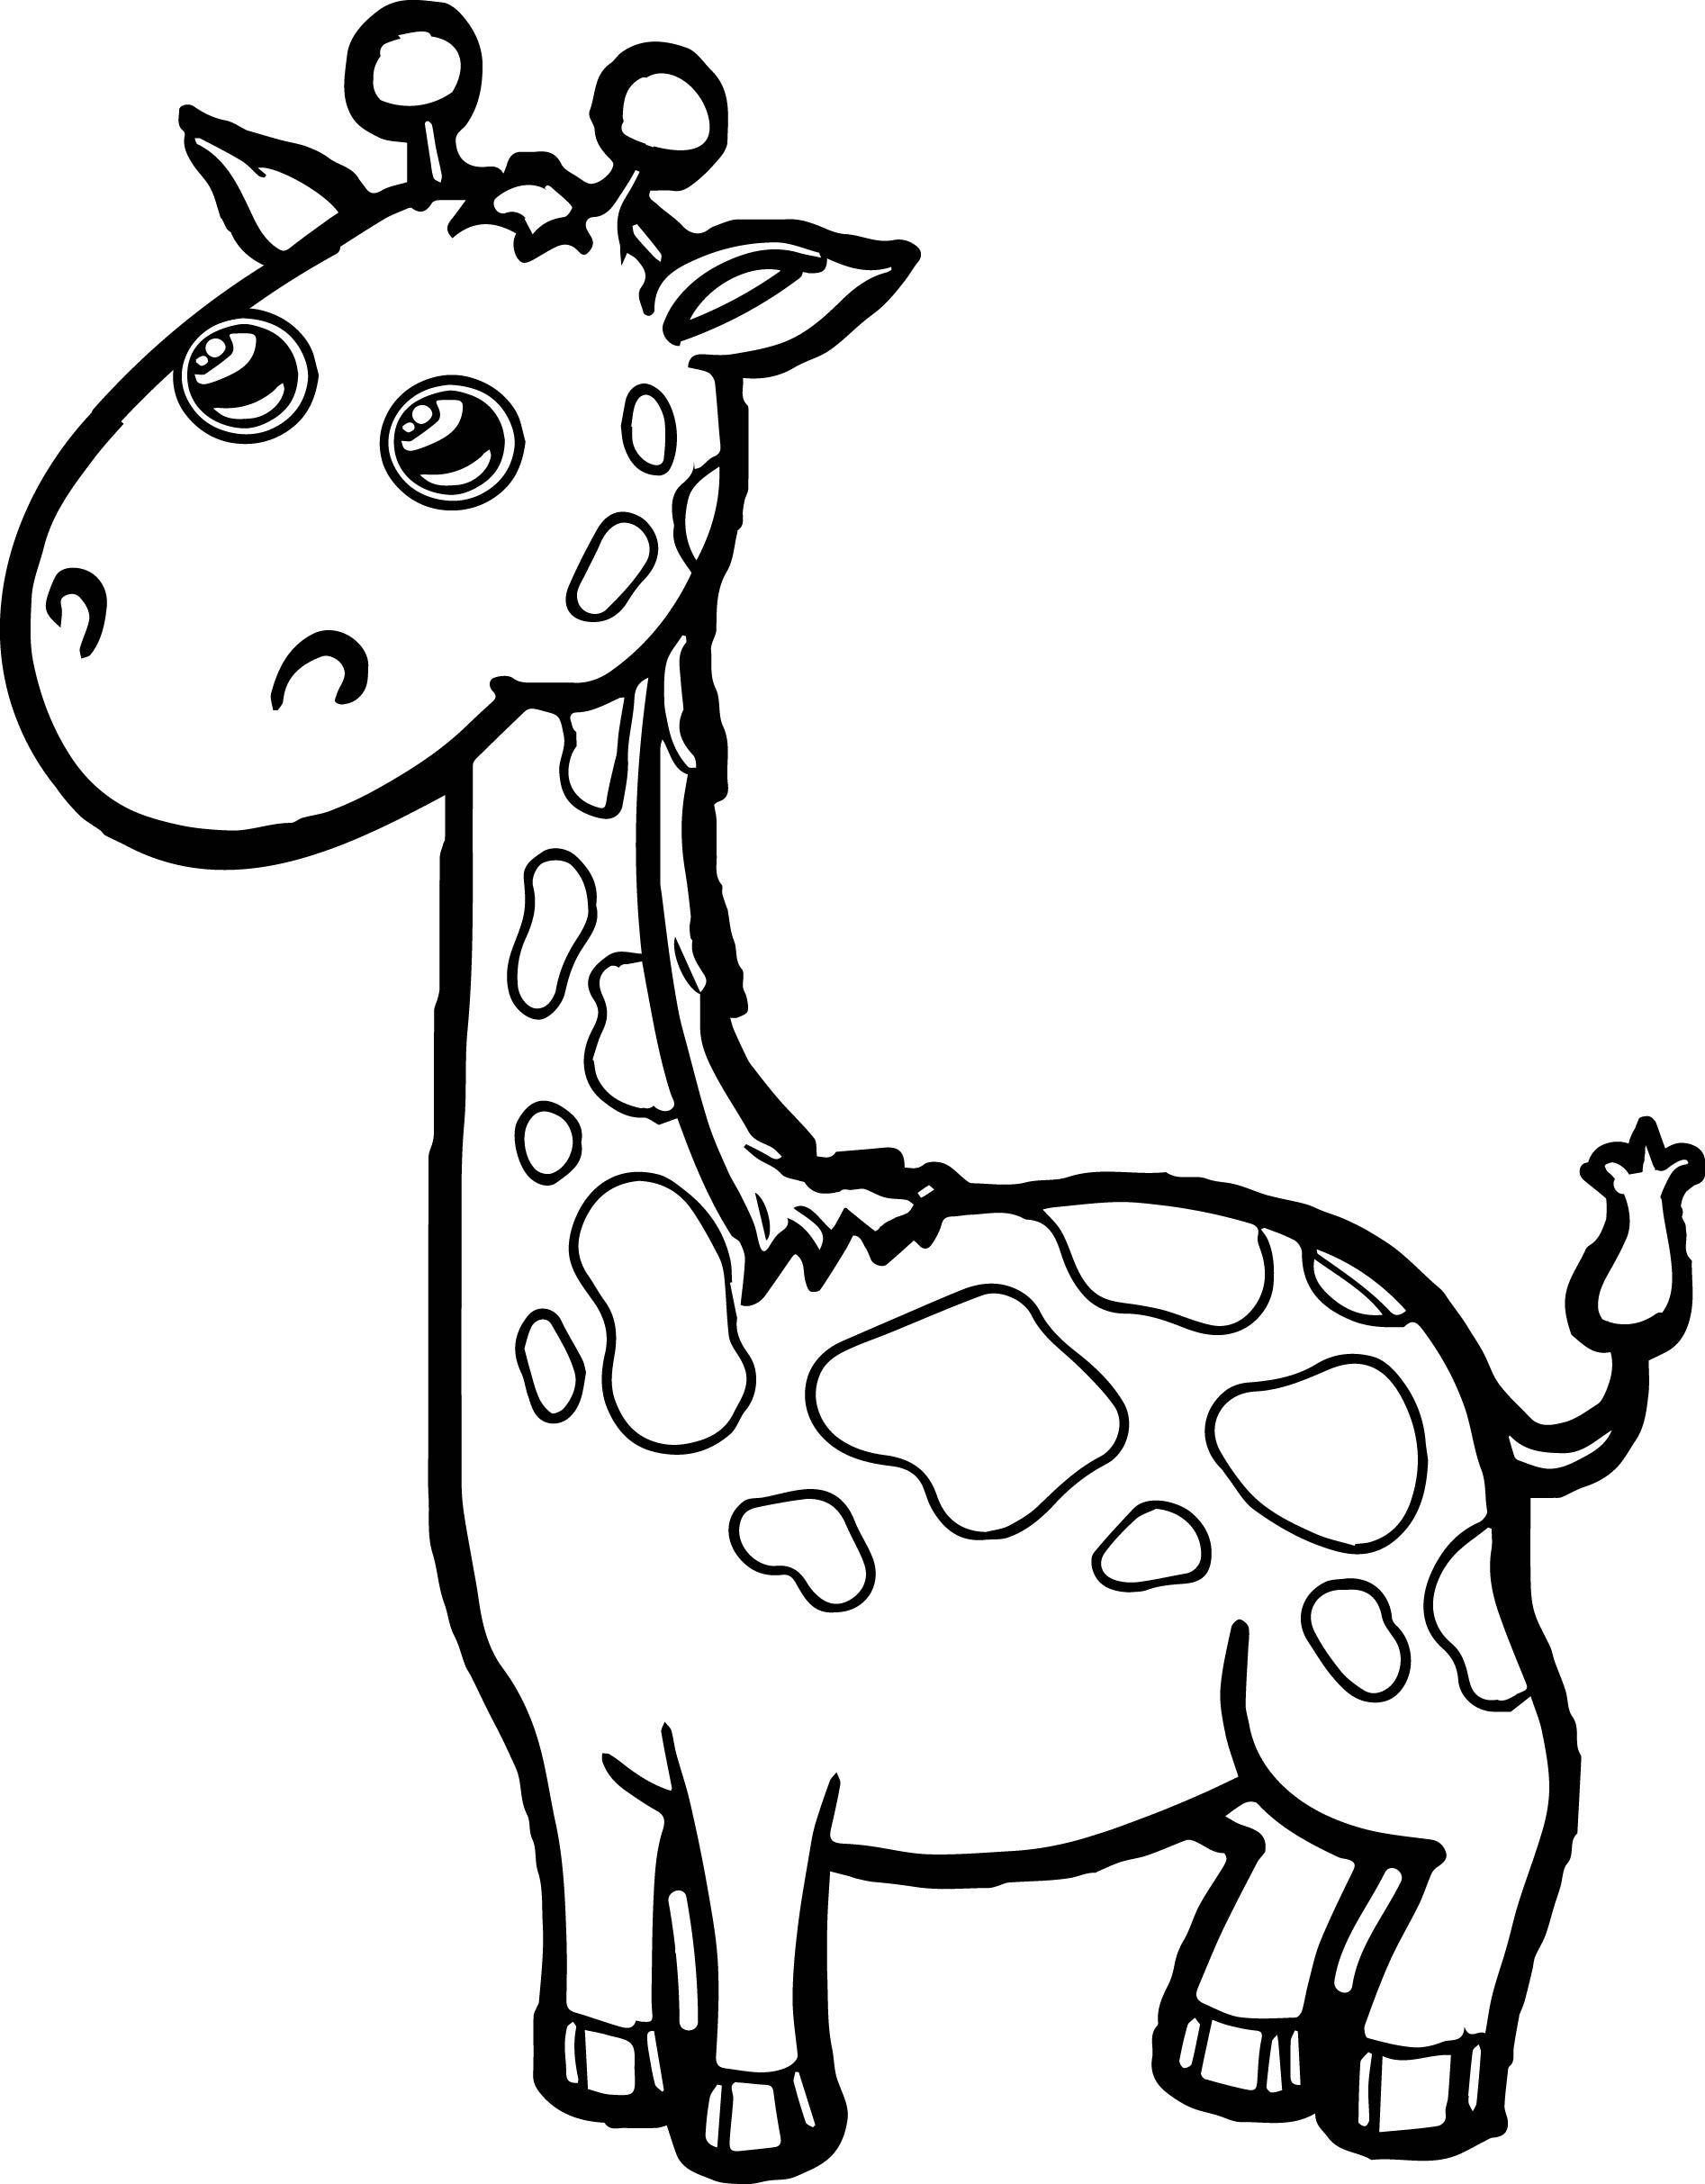 Zoo Giraffe Cartoon Coloring Page